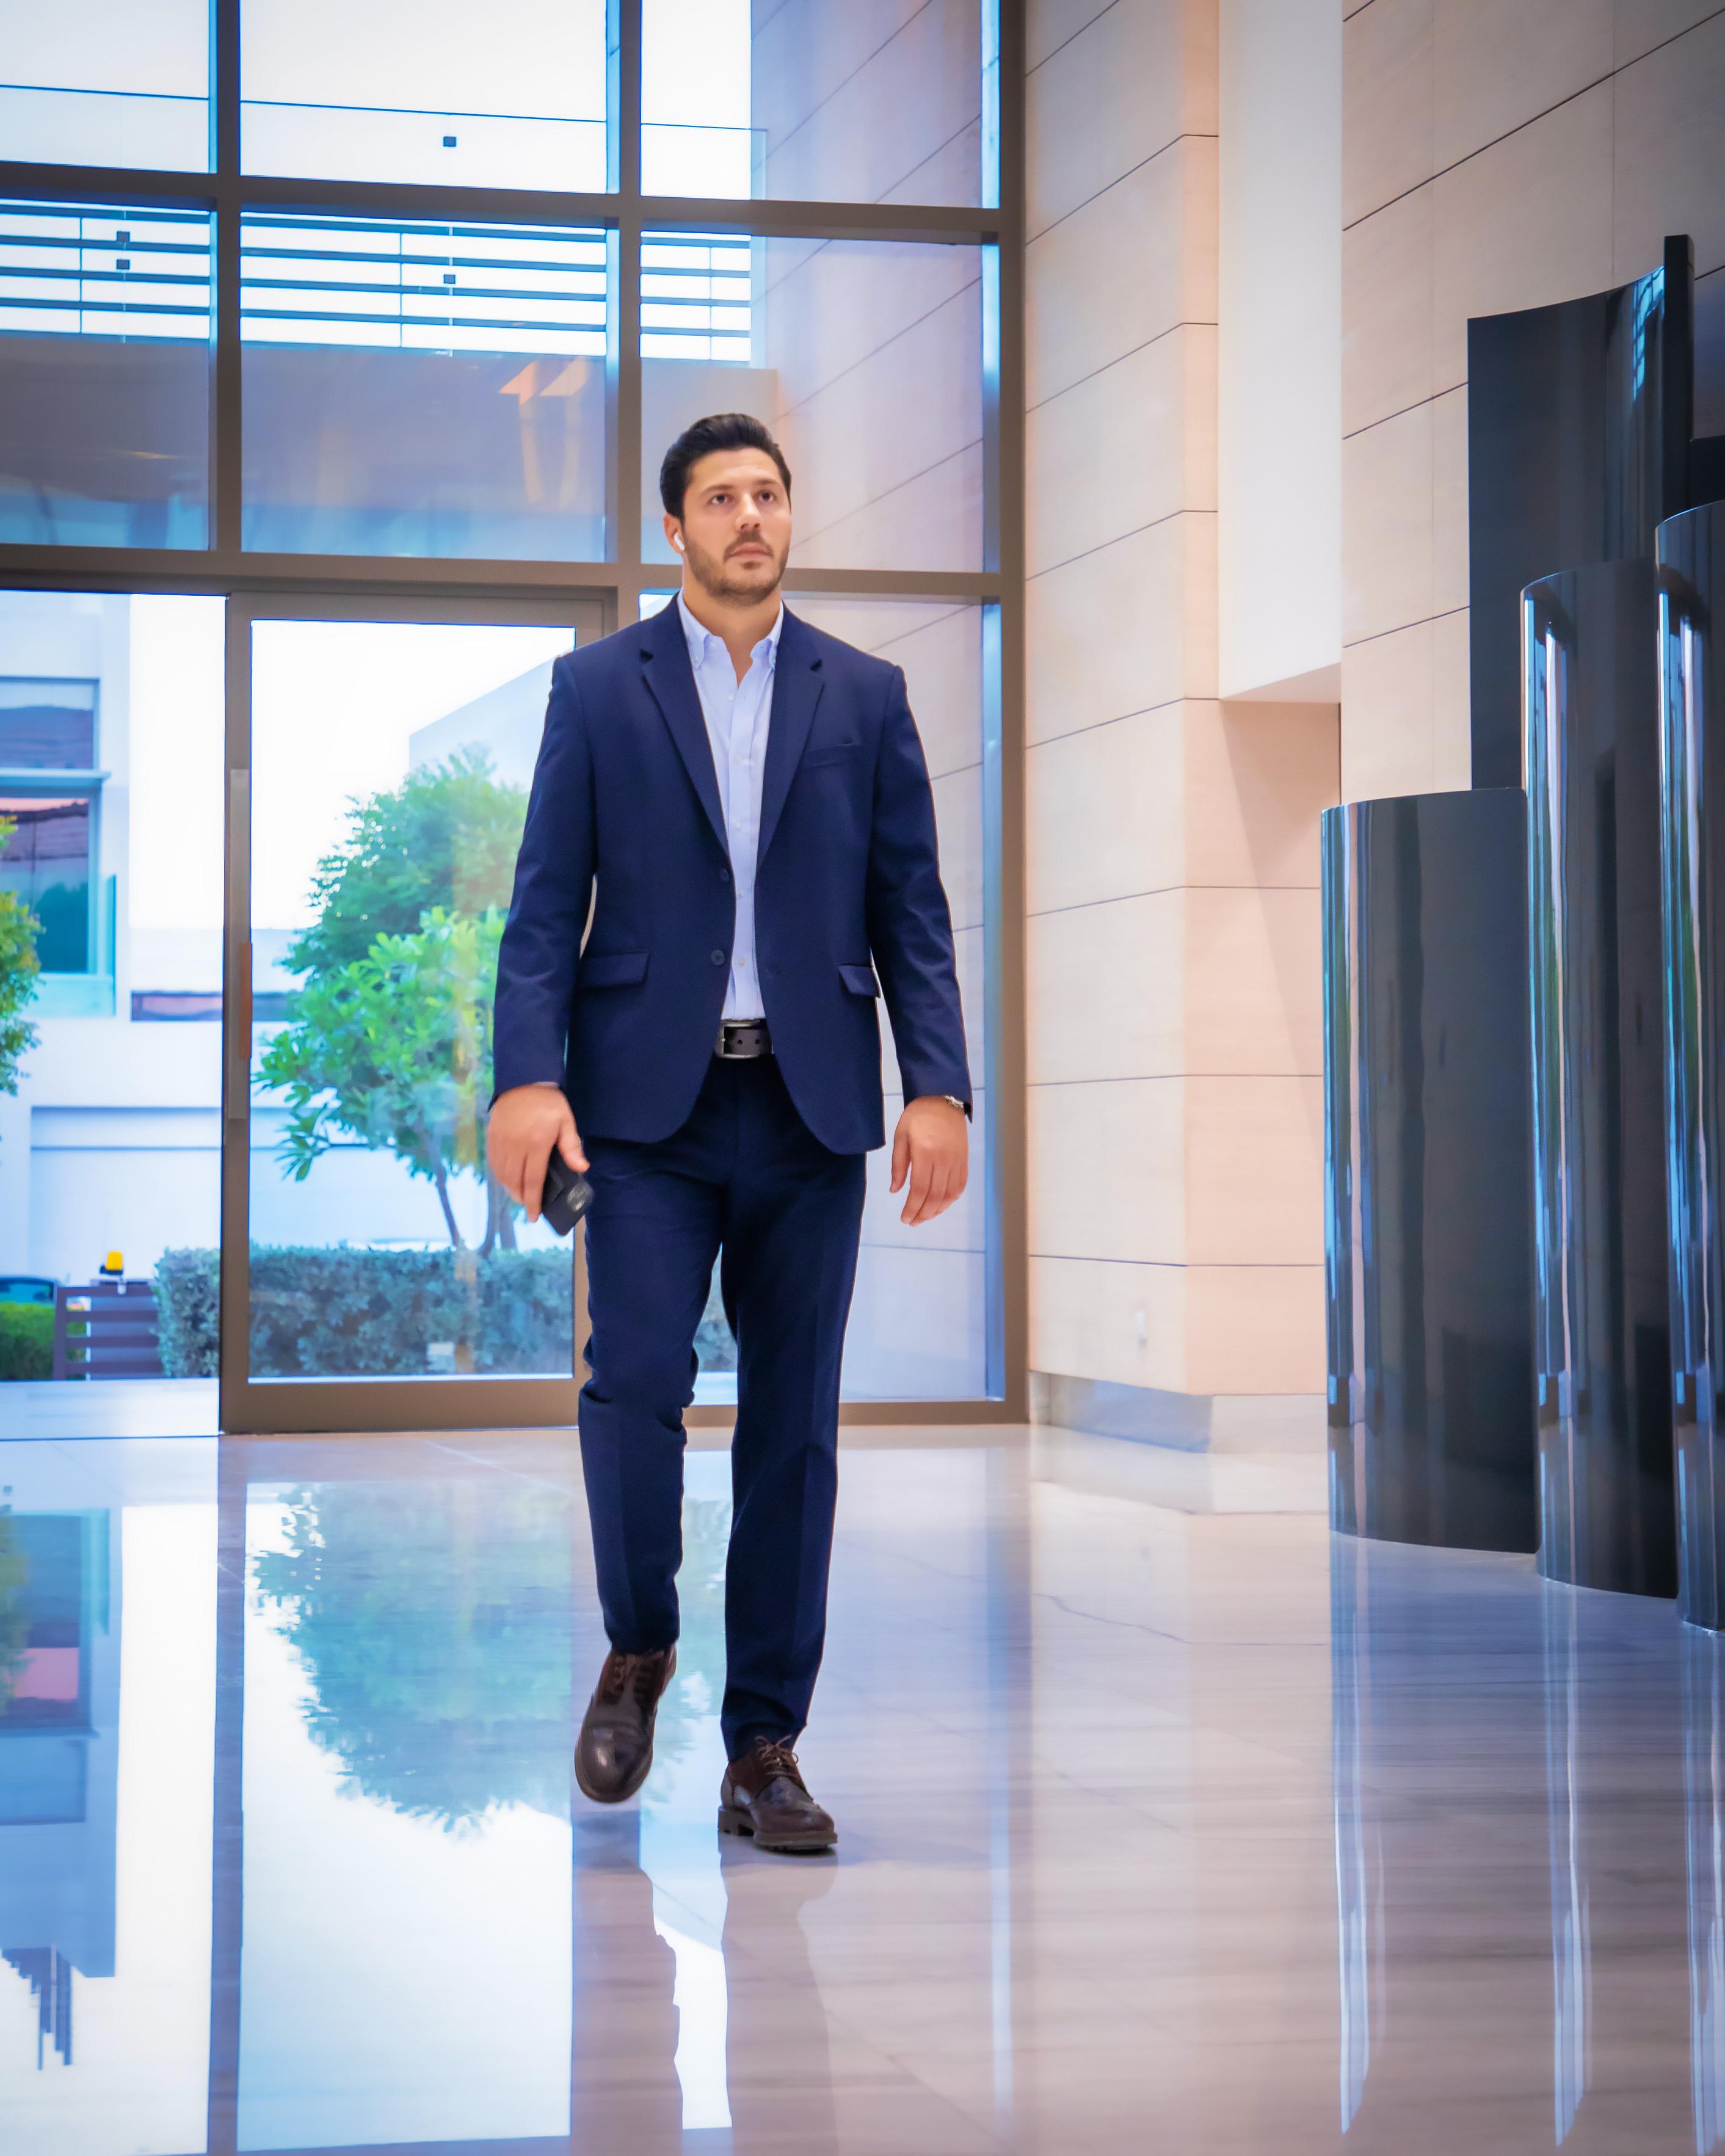 Ali Sbeity, Lebanese business man based in Dubai